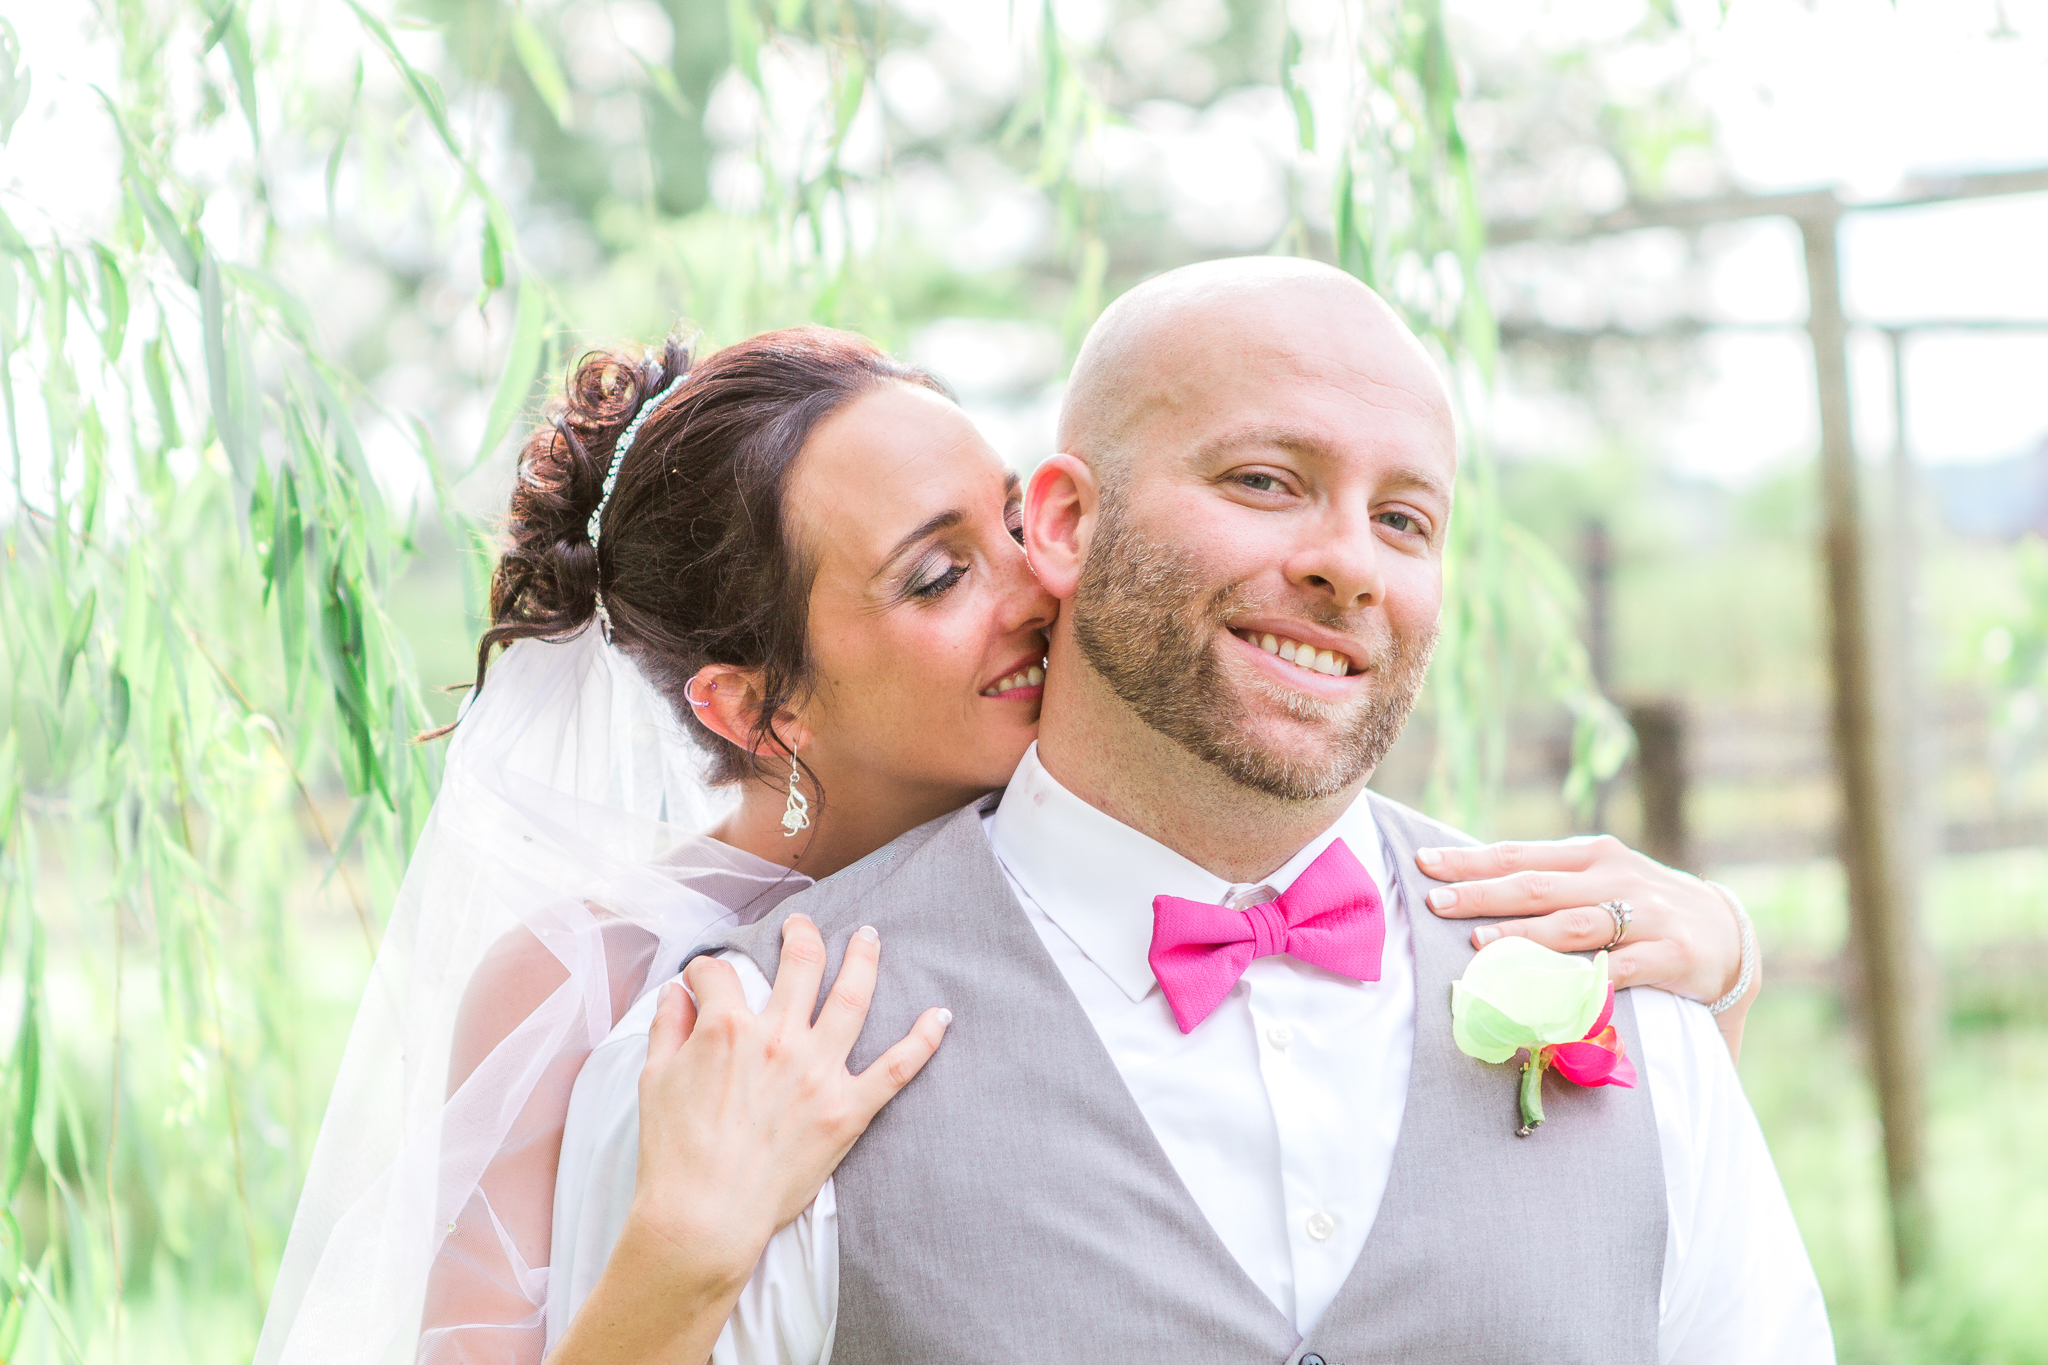 Richmond Kentucky Wedding Photographer - Ariana Jordan Photography -7-2.jpg